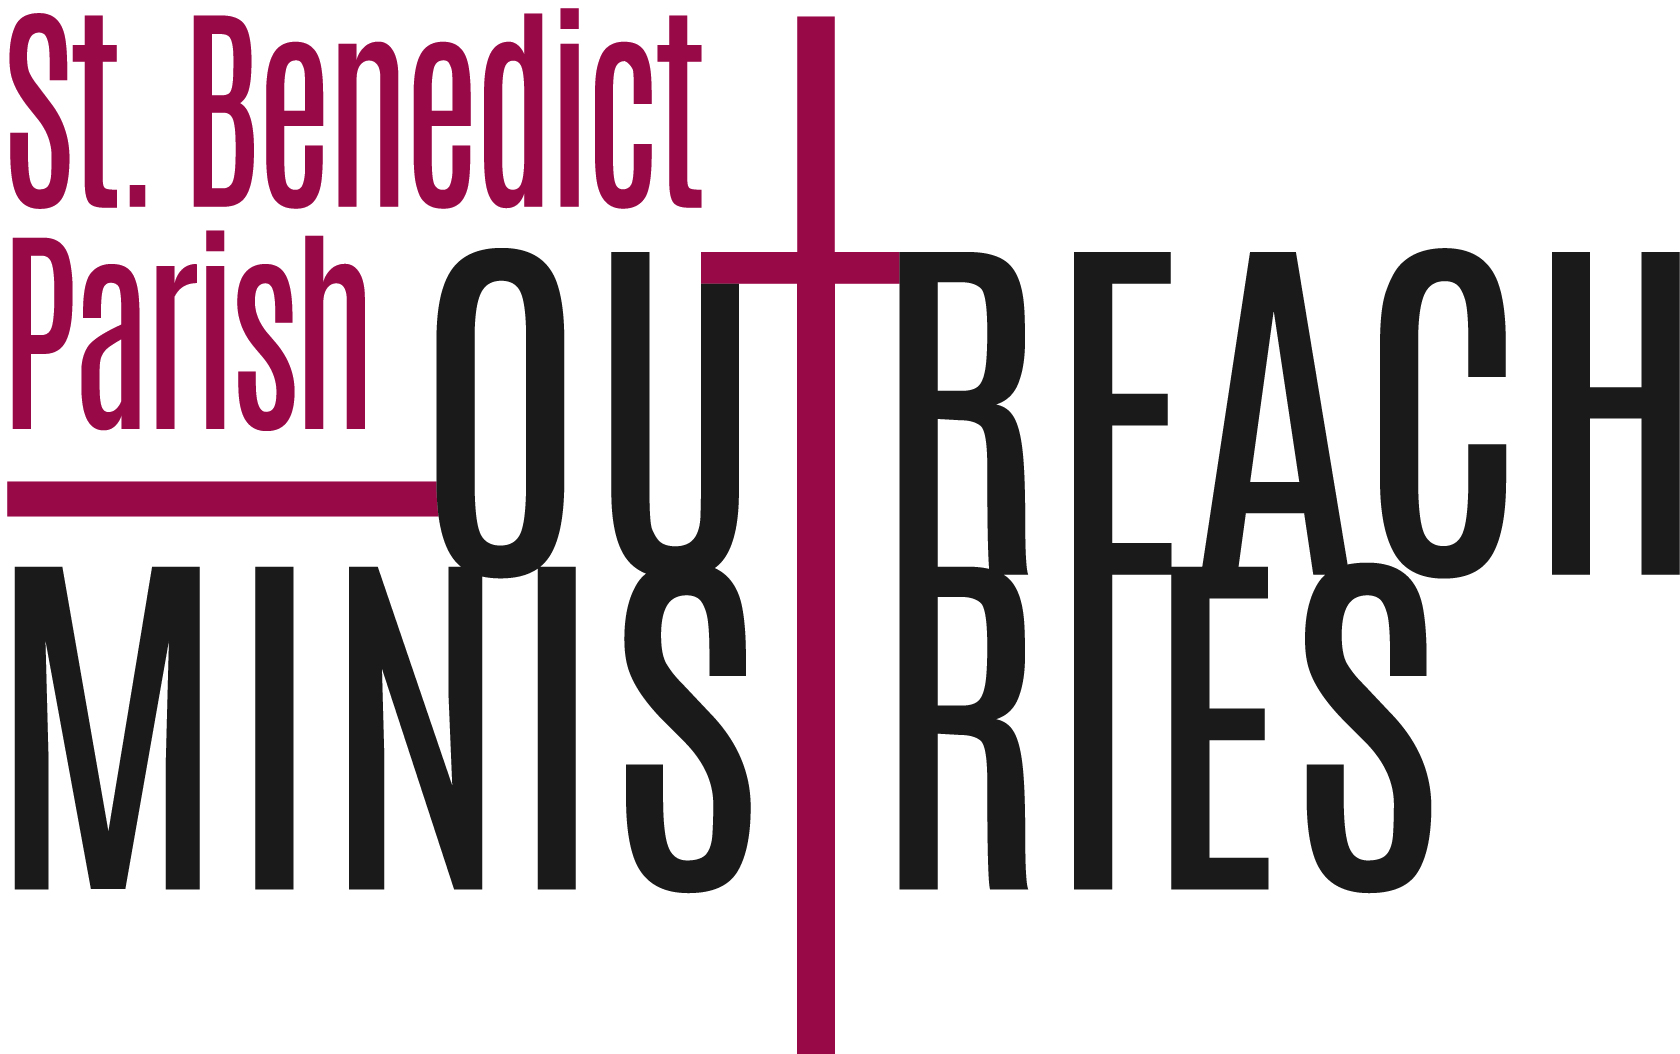 St. Bens Outreach Ministries.jpg